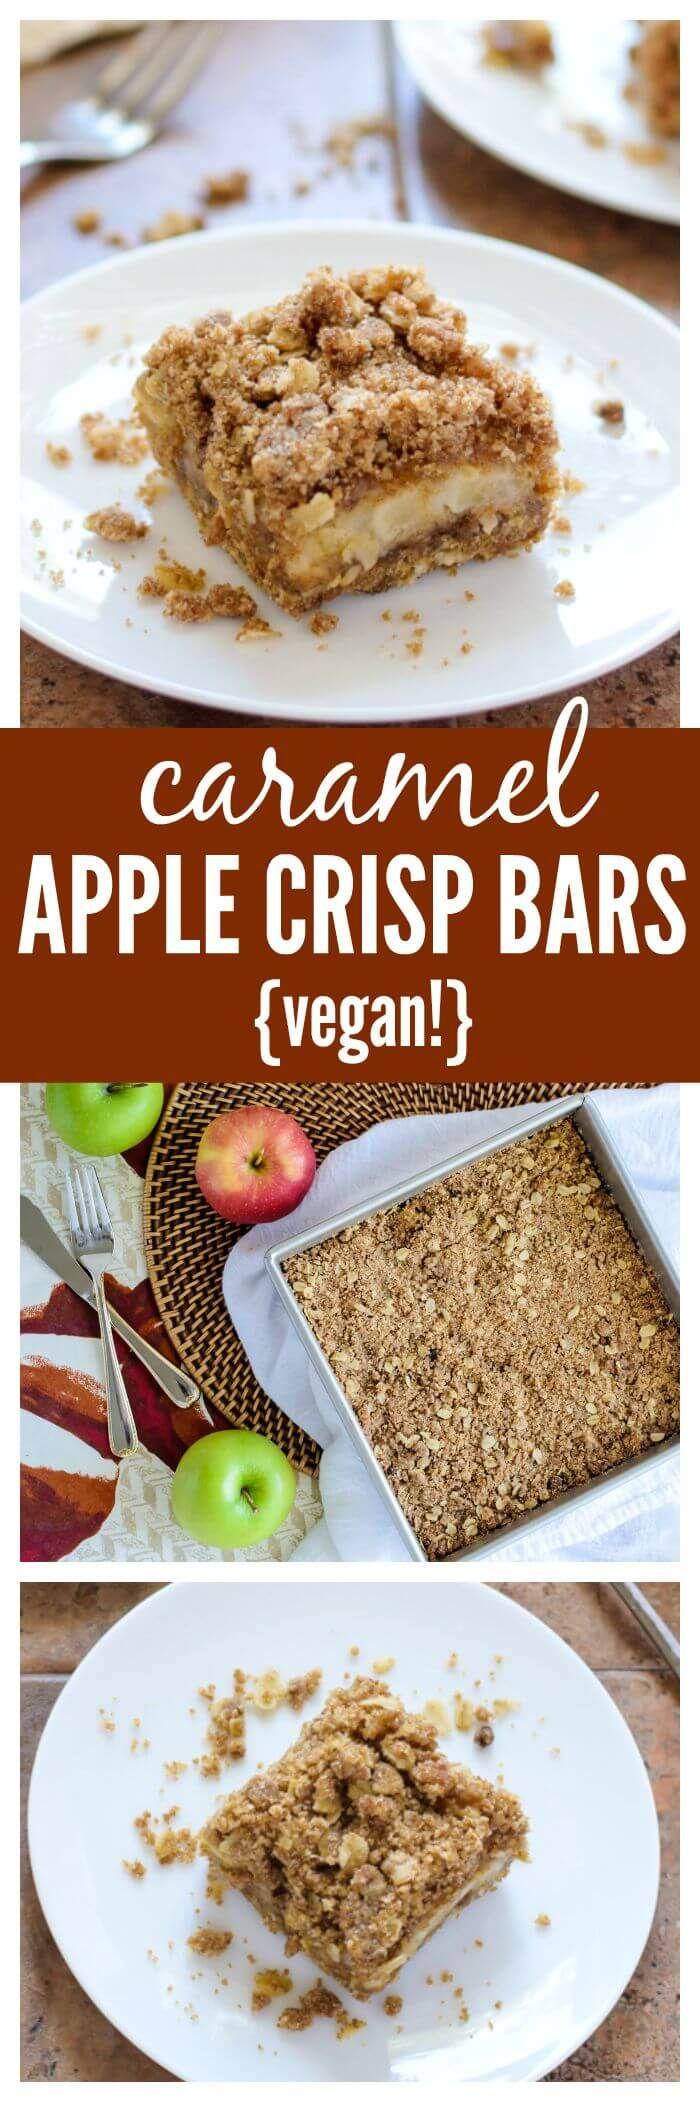 Karamell Apfel Crisp Bars. Ooey gooey Karamell-Apfel-Riegel mit Zimtstreusel …   – FOOD&BAKING